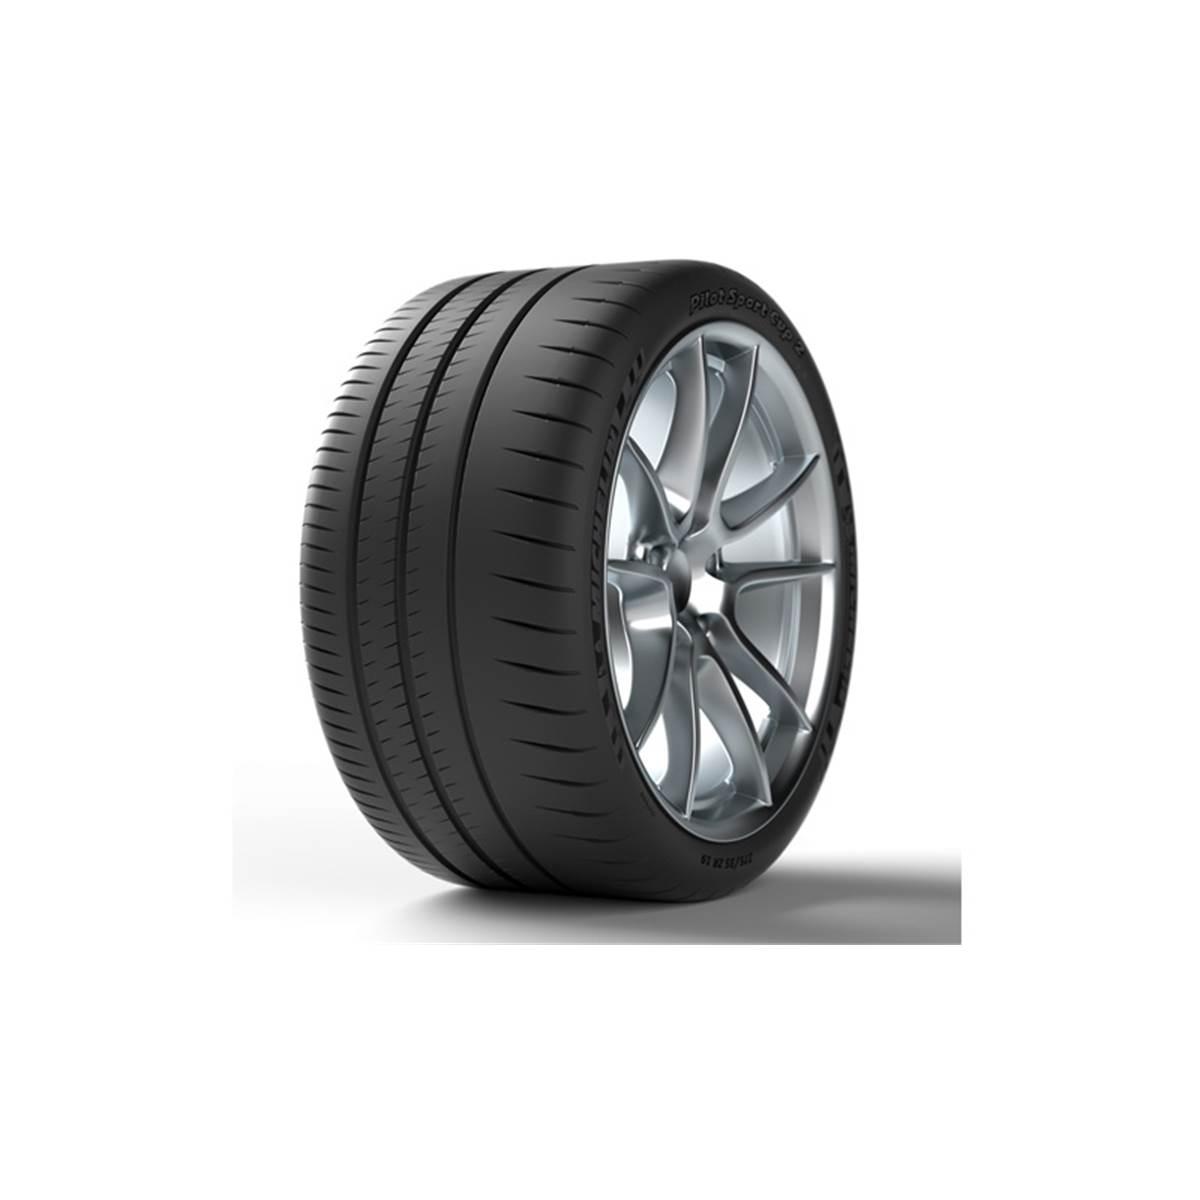 Pneu Michelin 235/35R19 91Y Pilot Sport Cup 2 XL